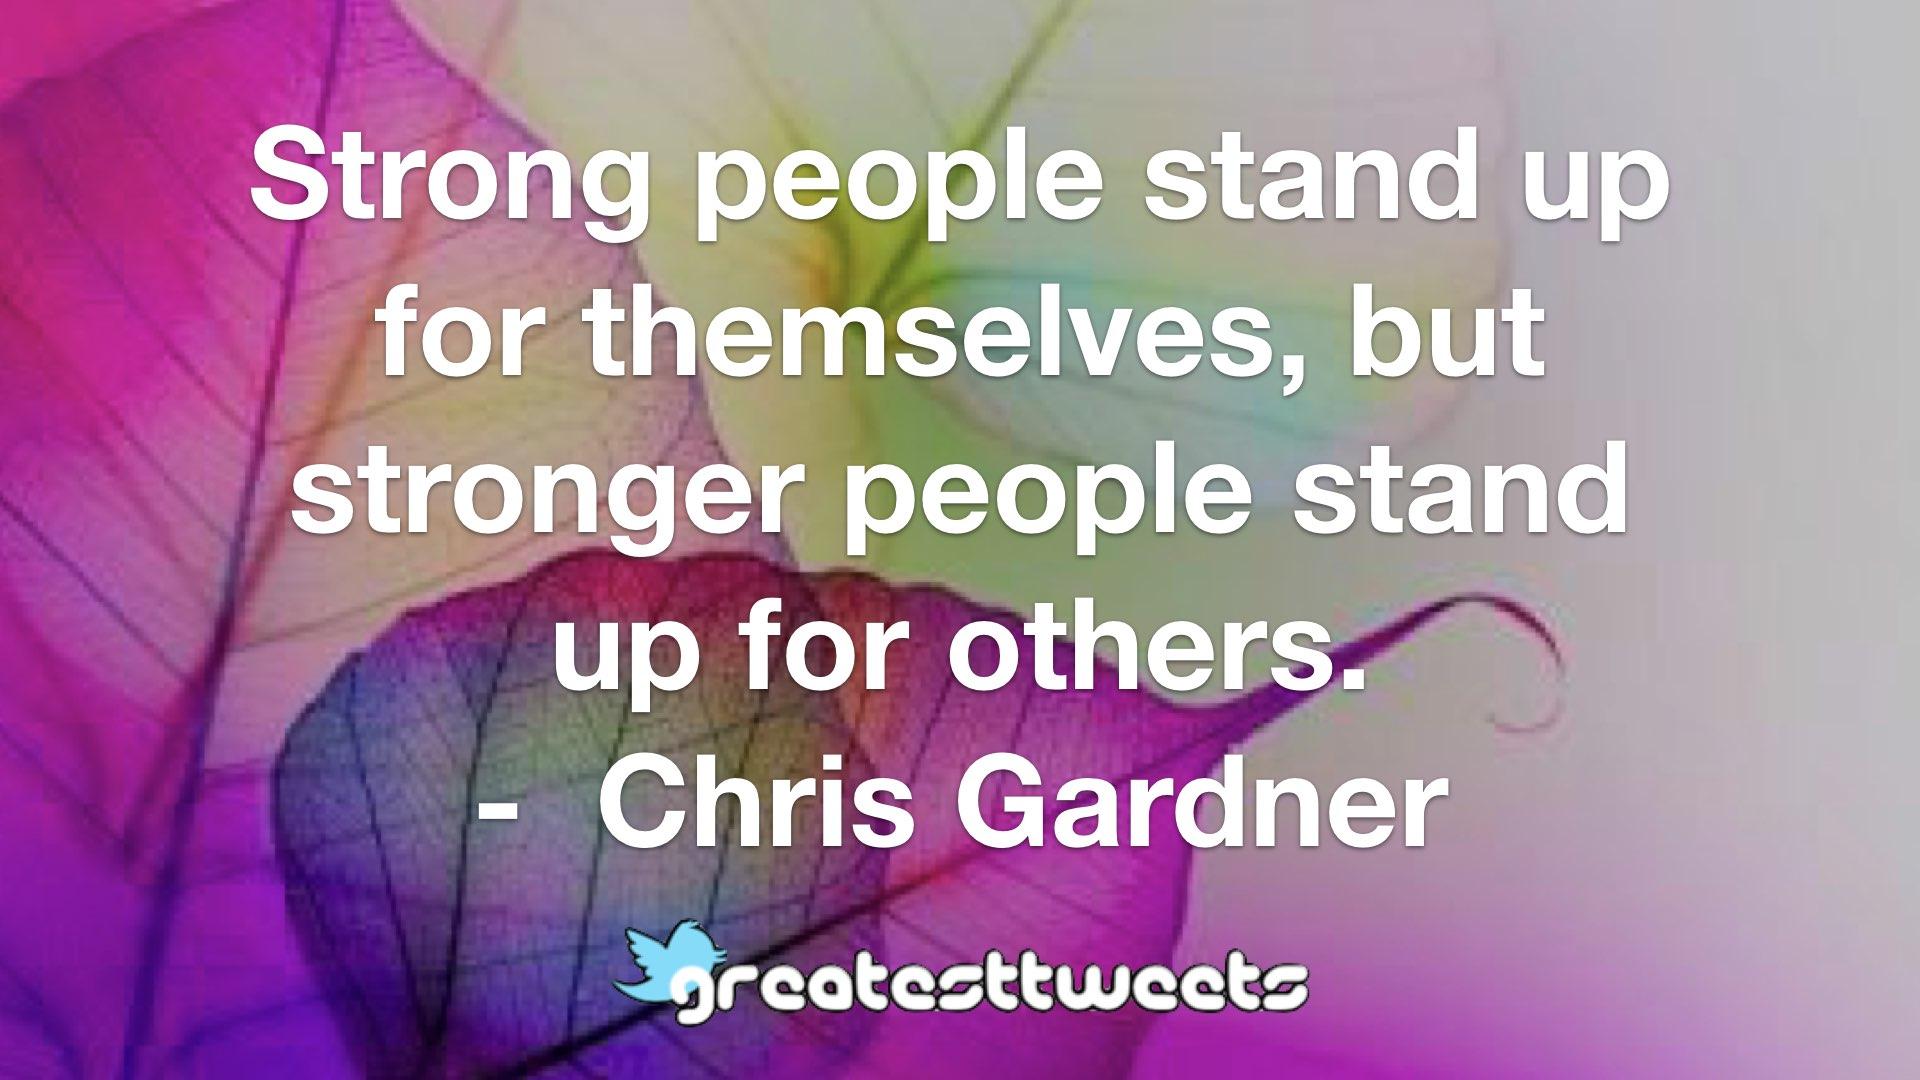 Chris Gardner Quotes   GreatestTweets.com